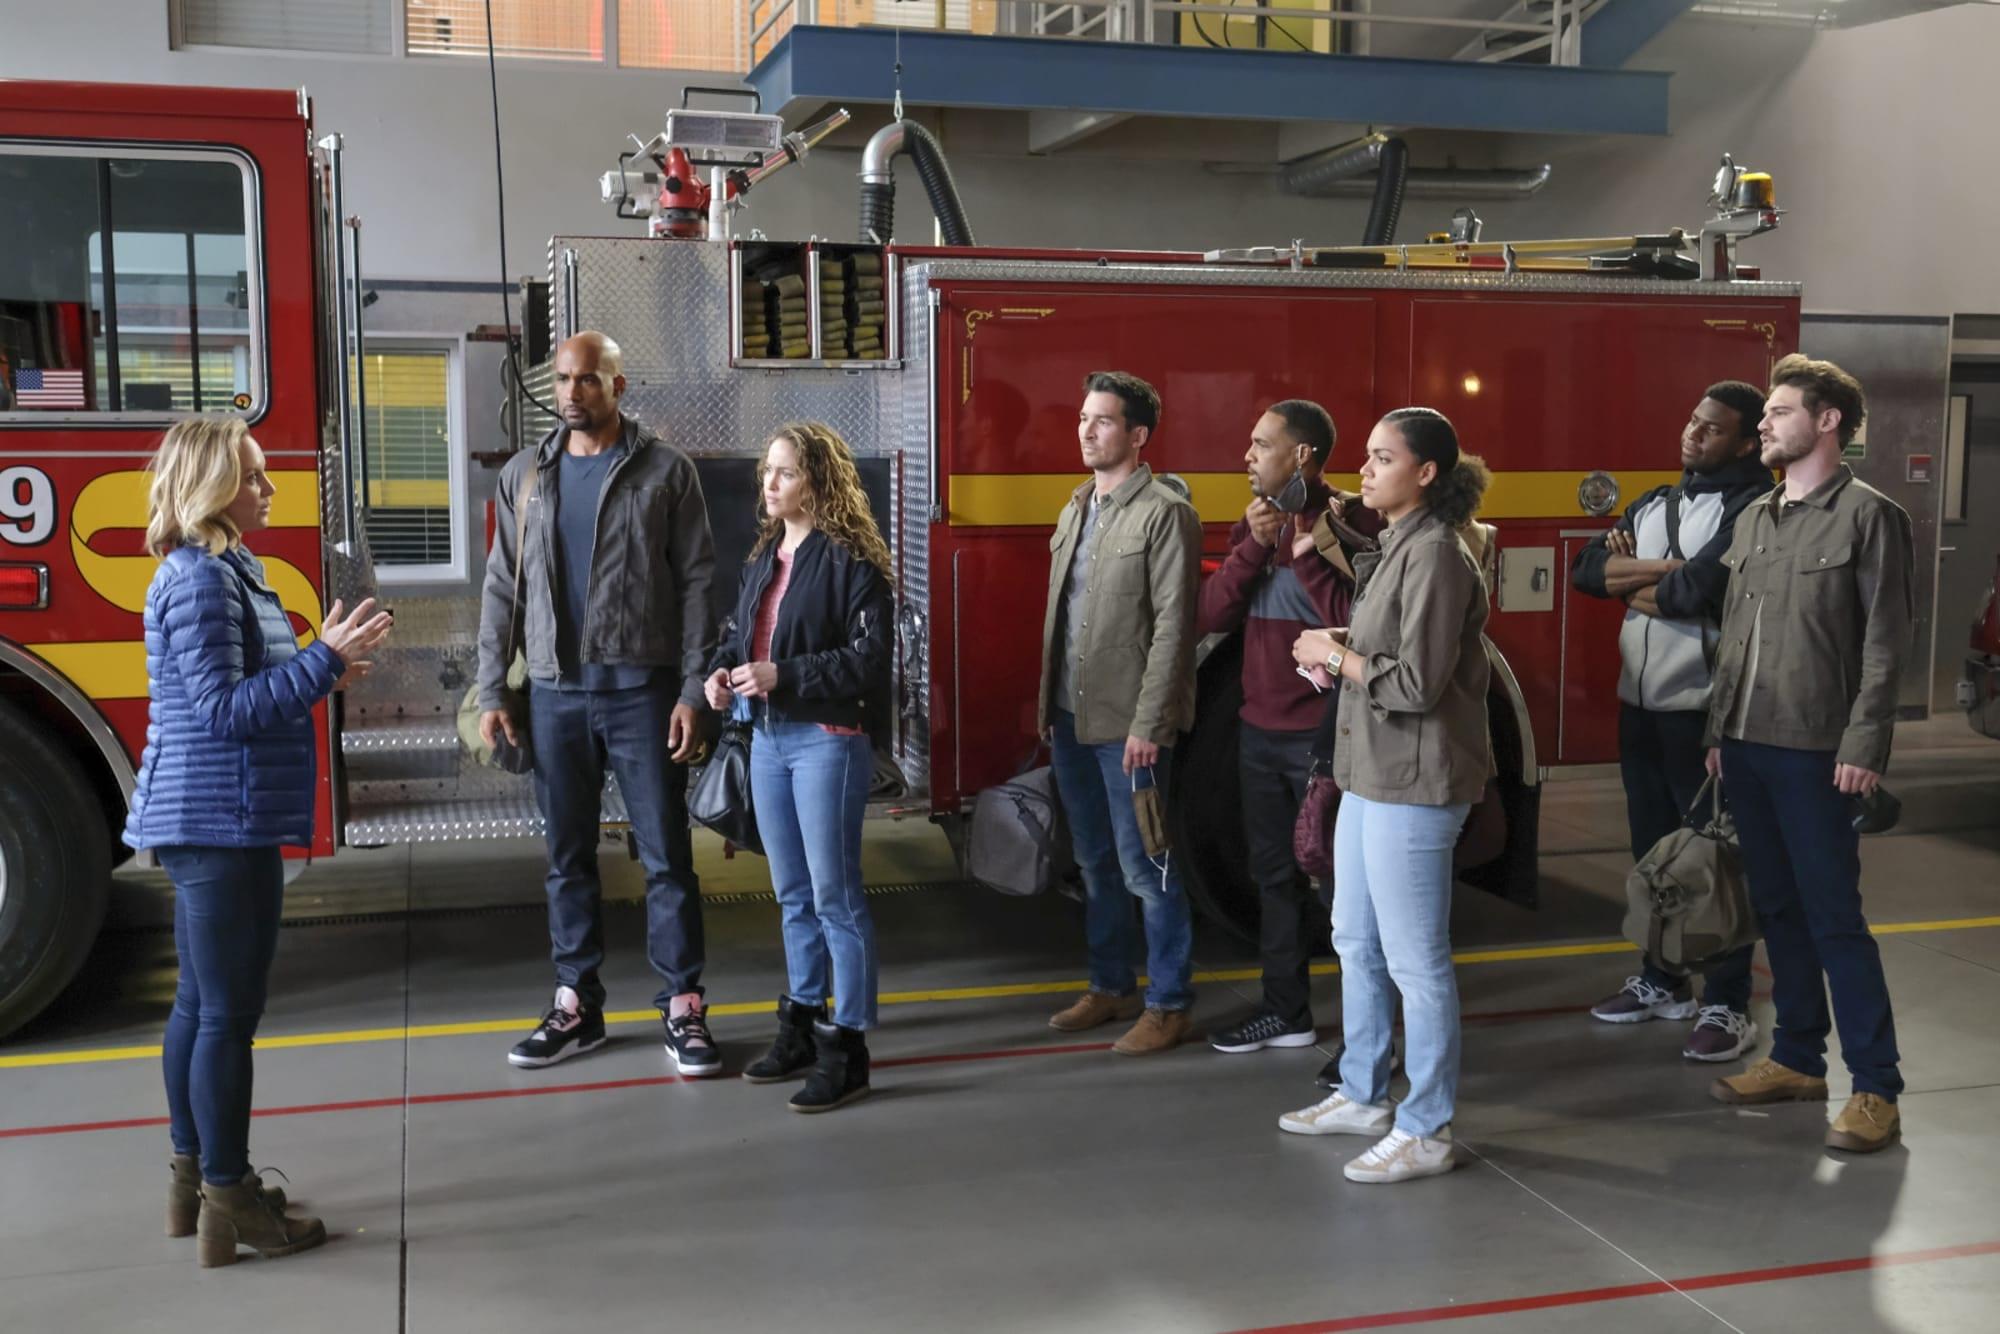 Station 19 Season 4 Episode 15